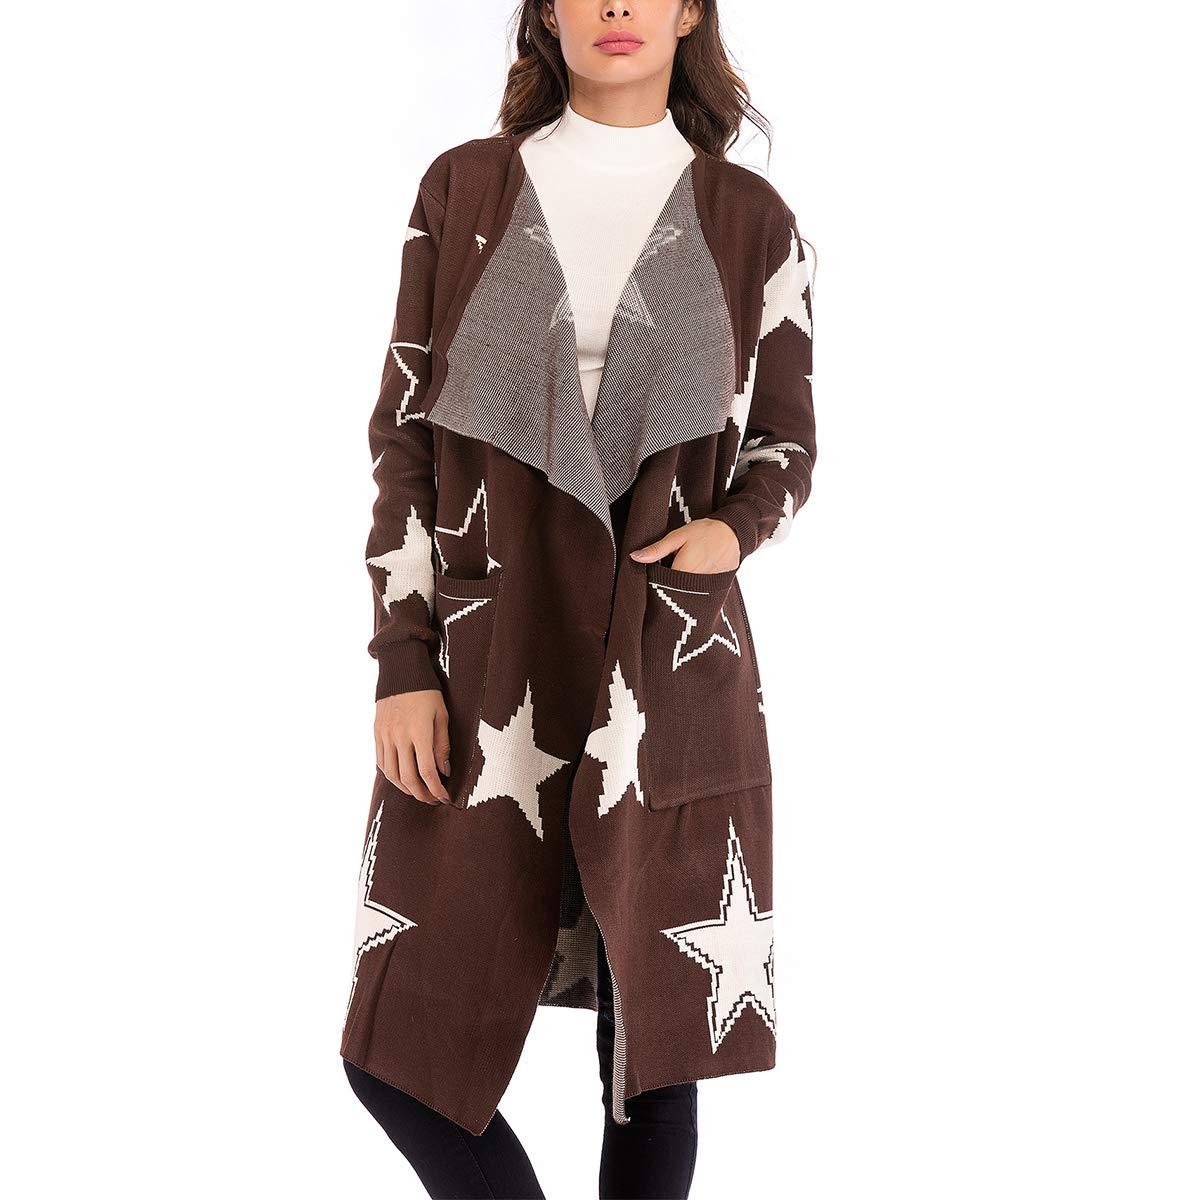 Coffee Star Print Knit Coat Long Sleeve Pocket Soft Overcoat For Women